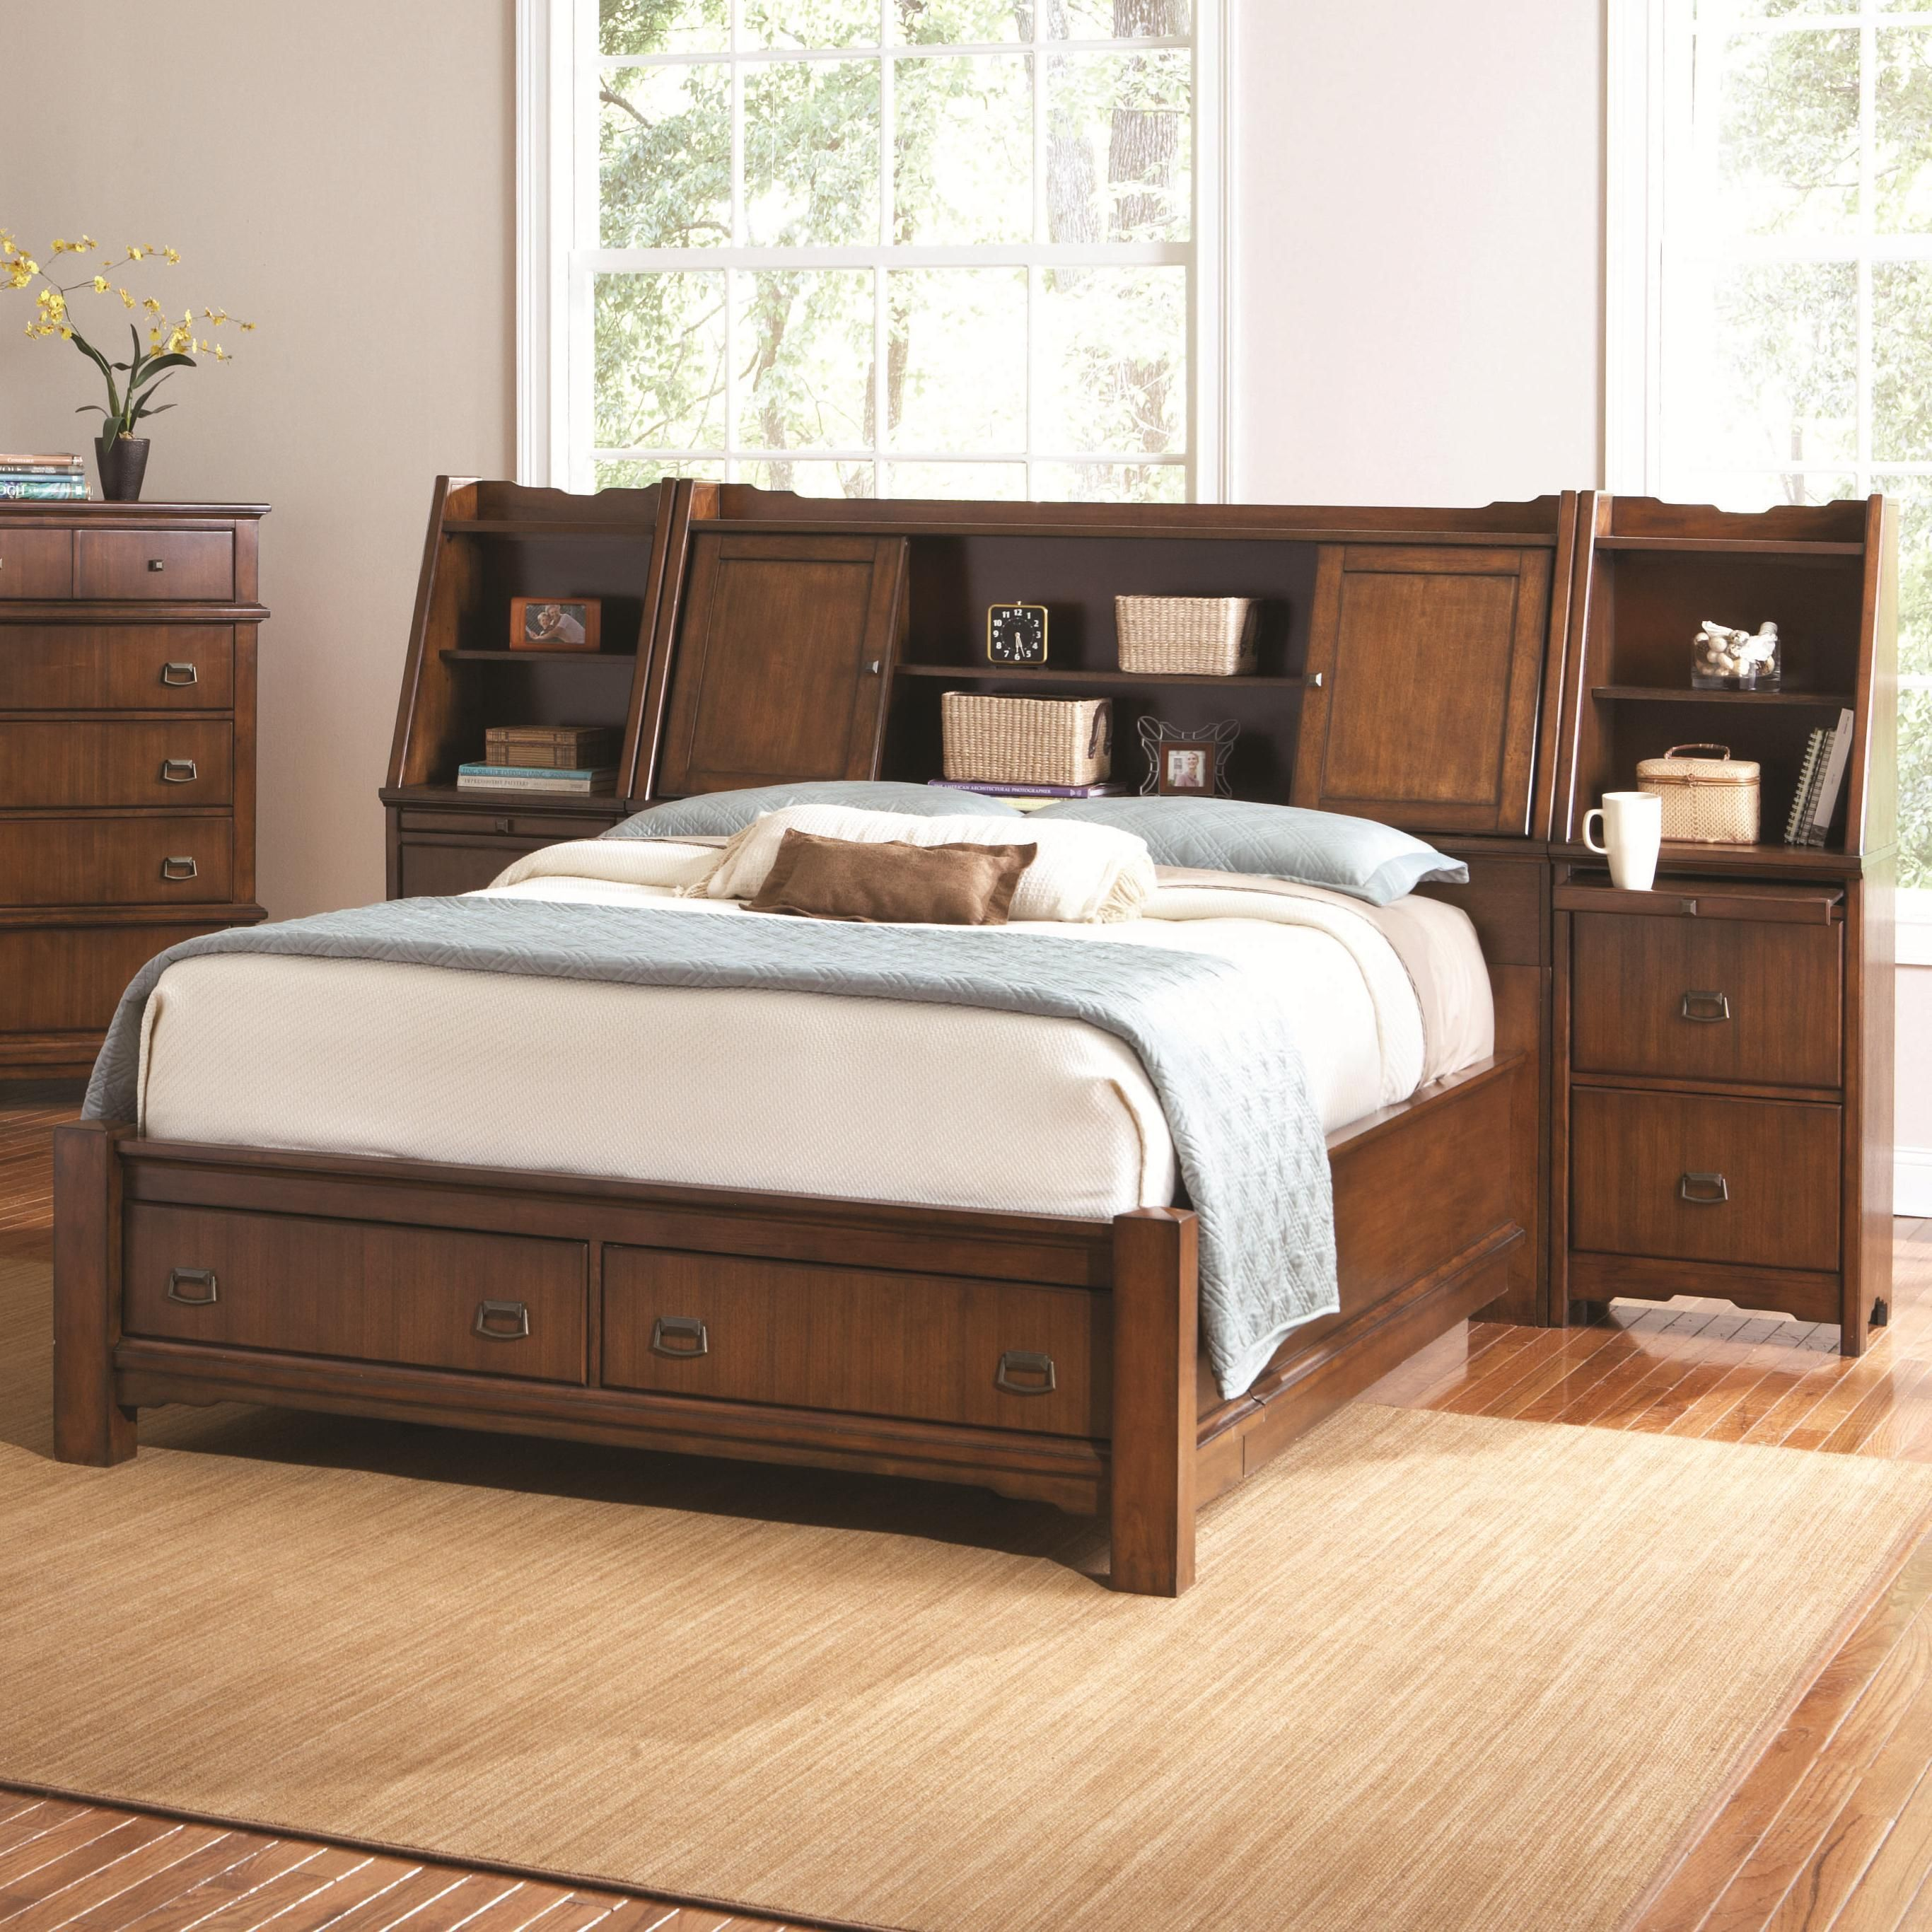 Average Bedroom Size For King Bed